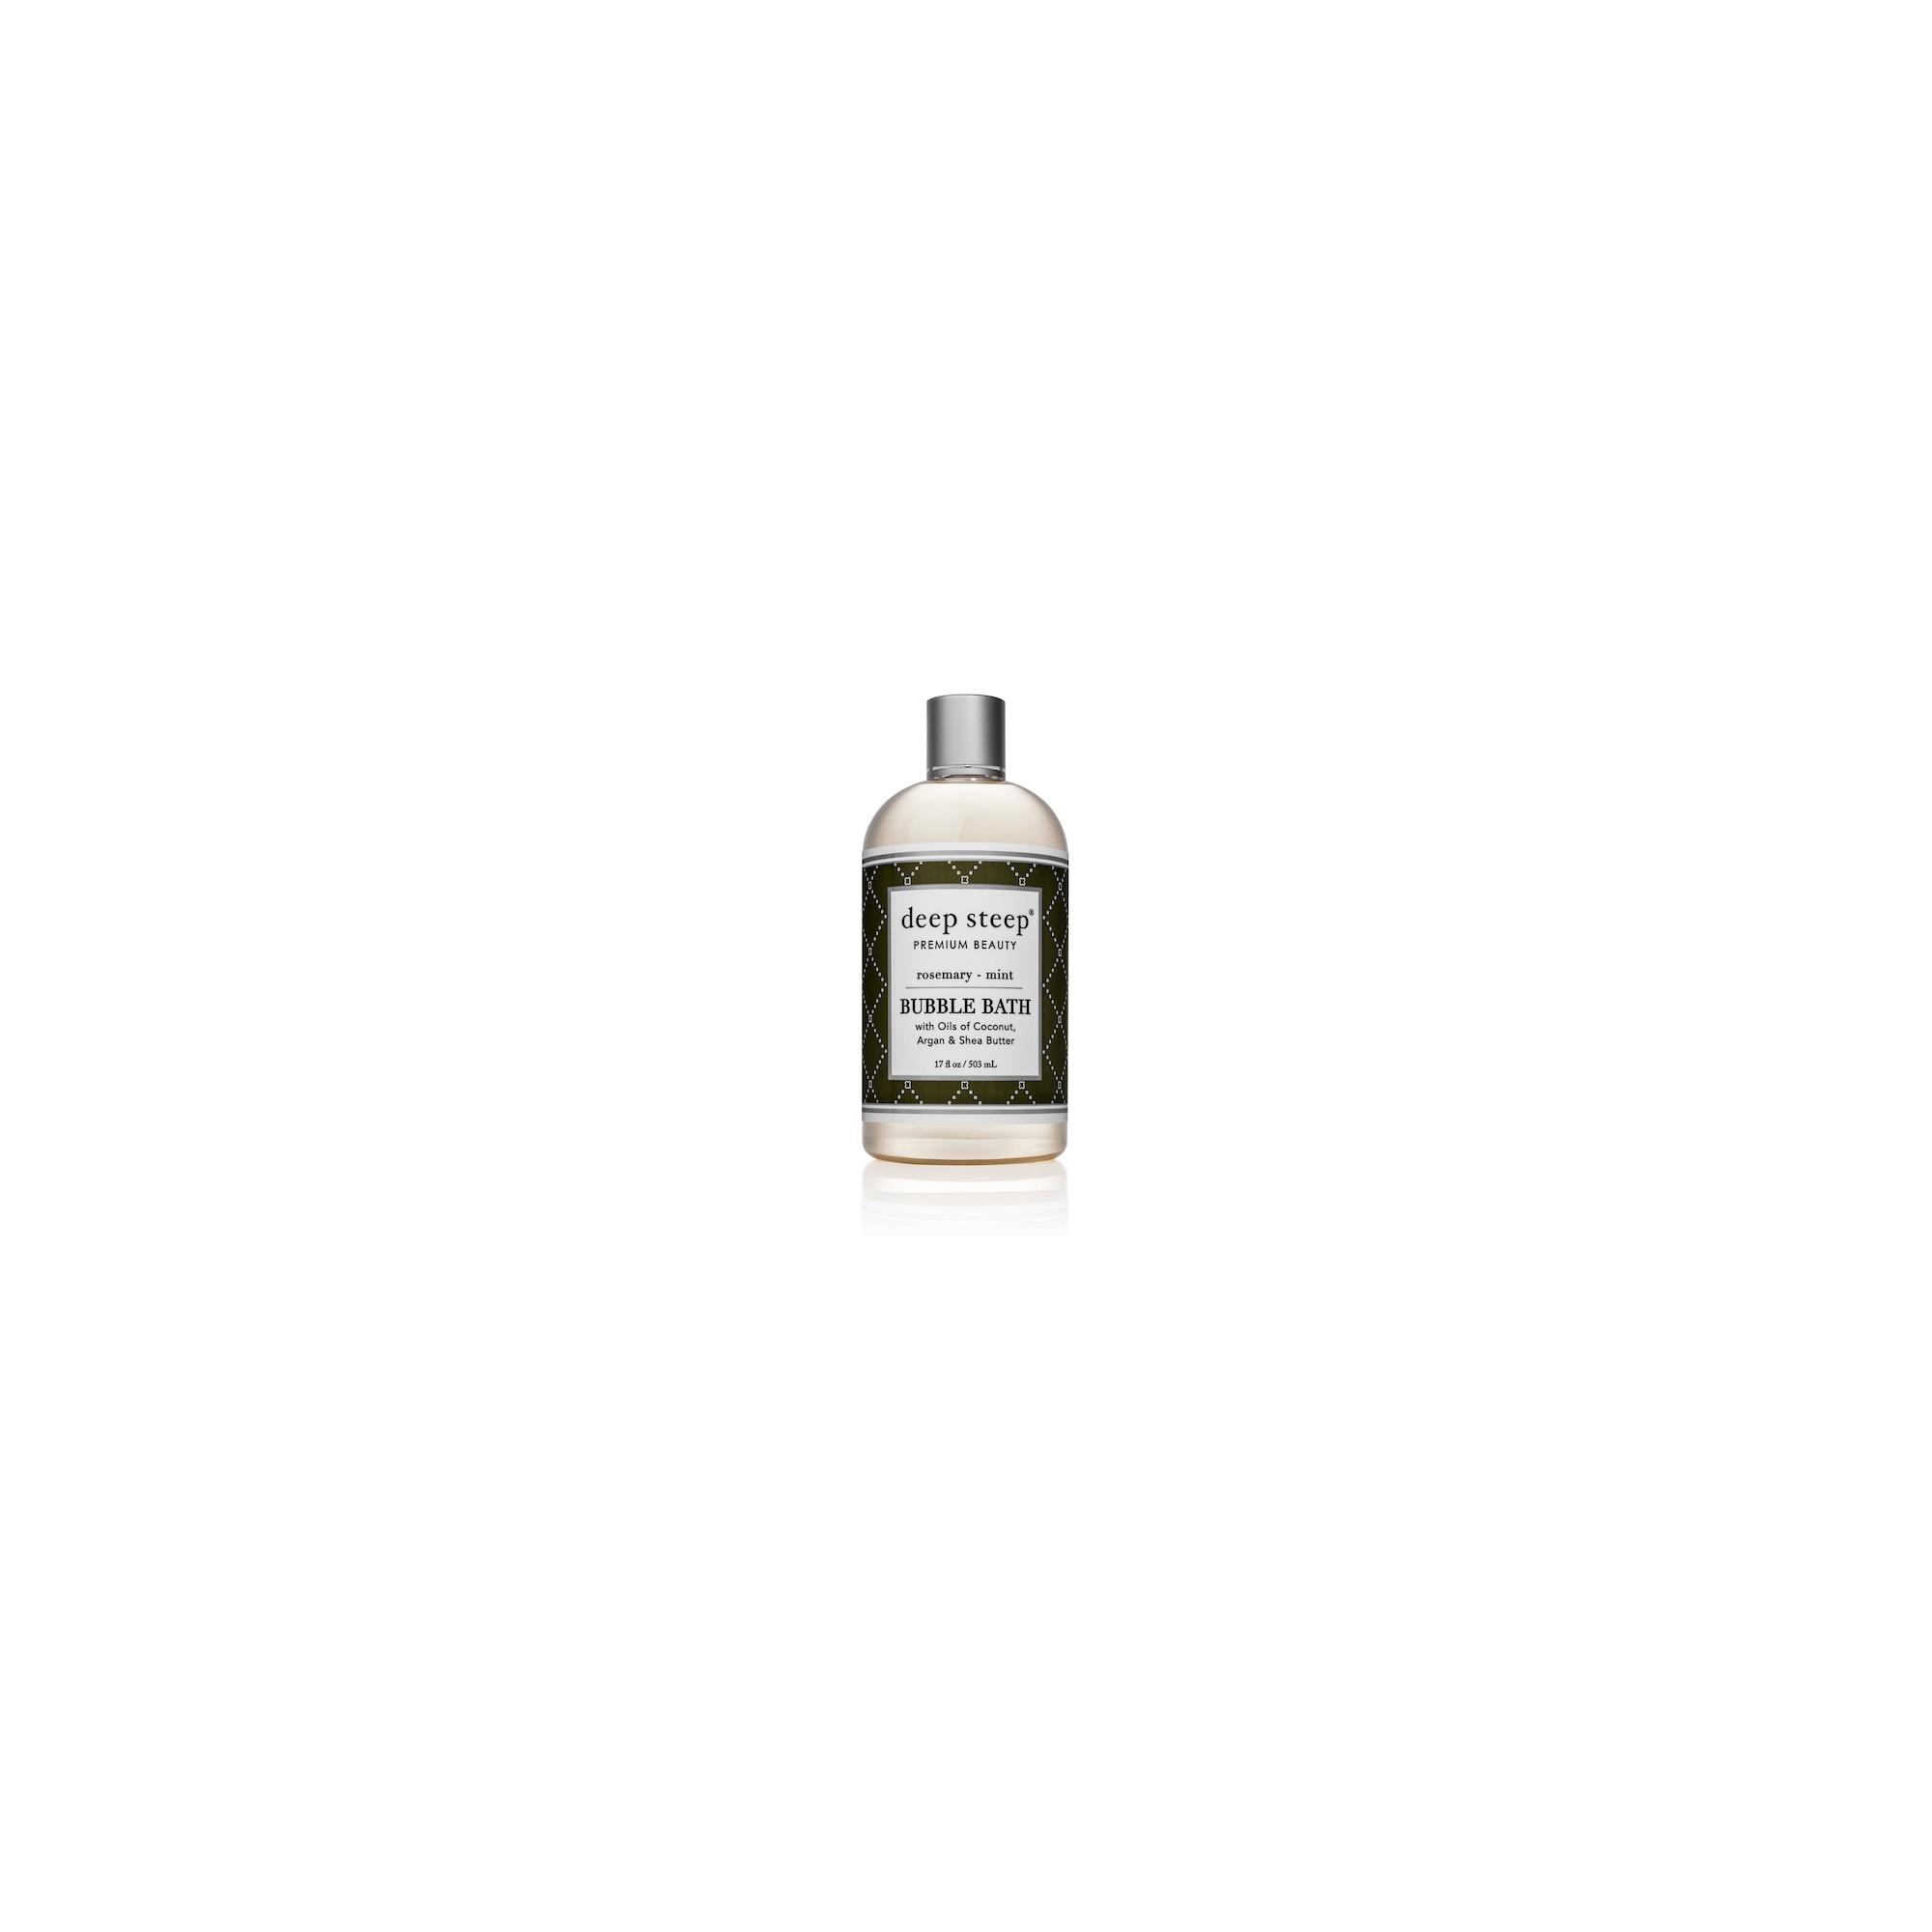 Deep Steep Rosemary Mint Bubble Bath 17 Fl Oz Body Cleanser